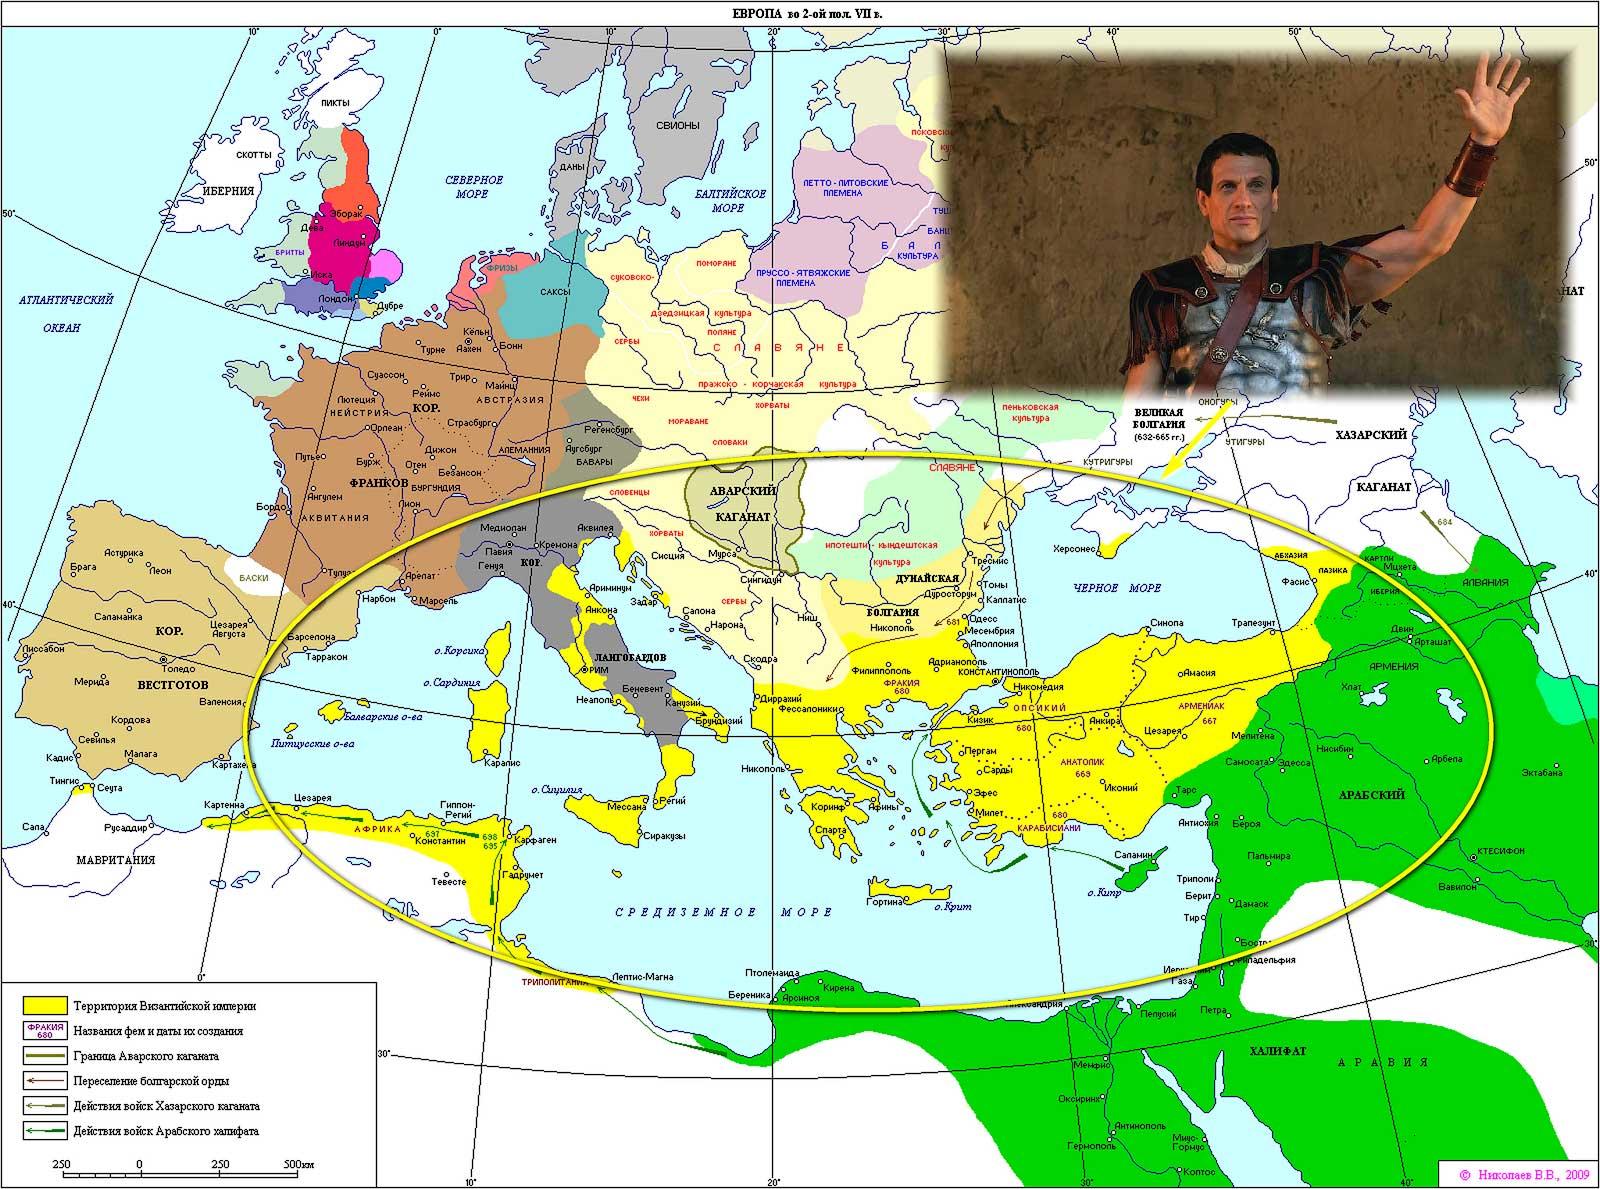 Карта границ Византии в 2-ой половине VIII века